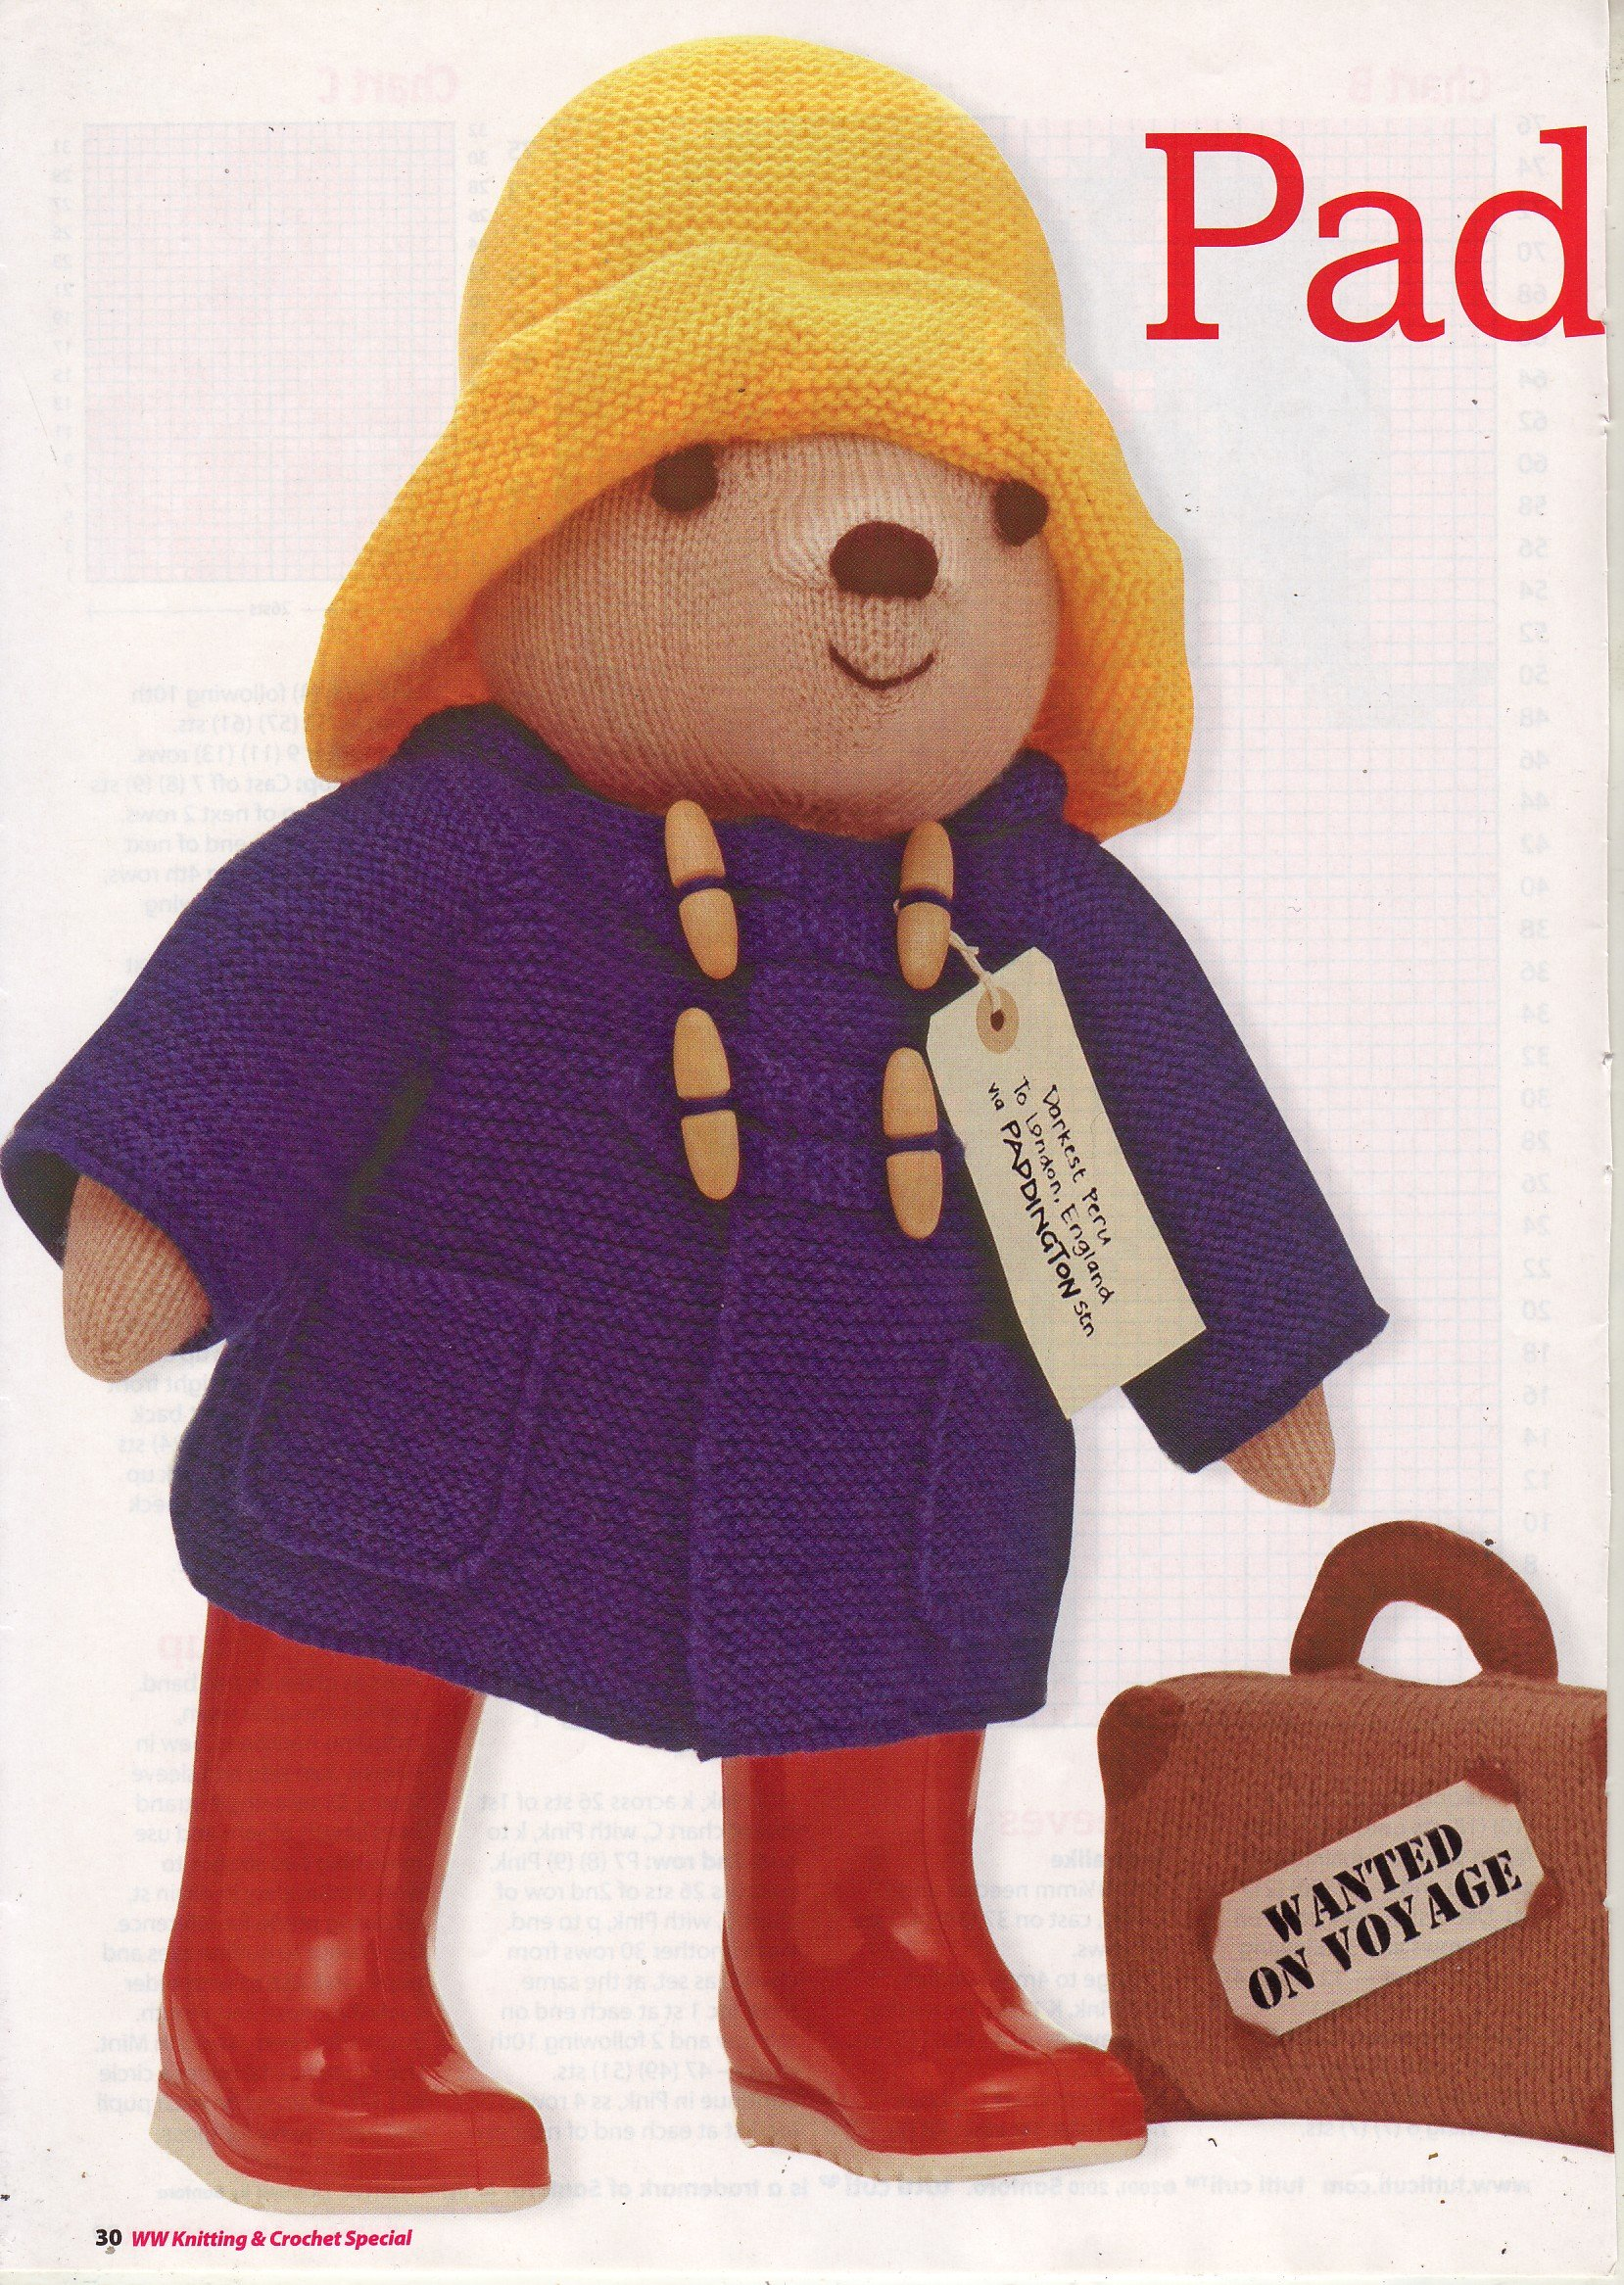 Paddington Bear By Alan Dart Toy Knitting Pattern Measurements 48cm